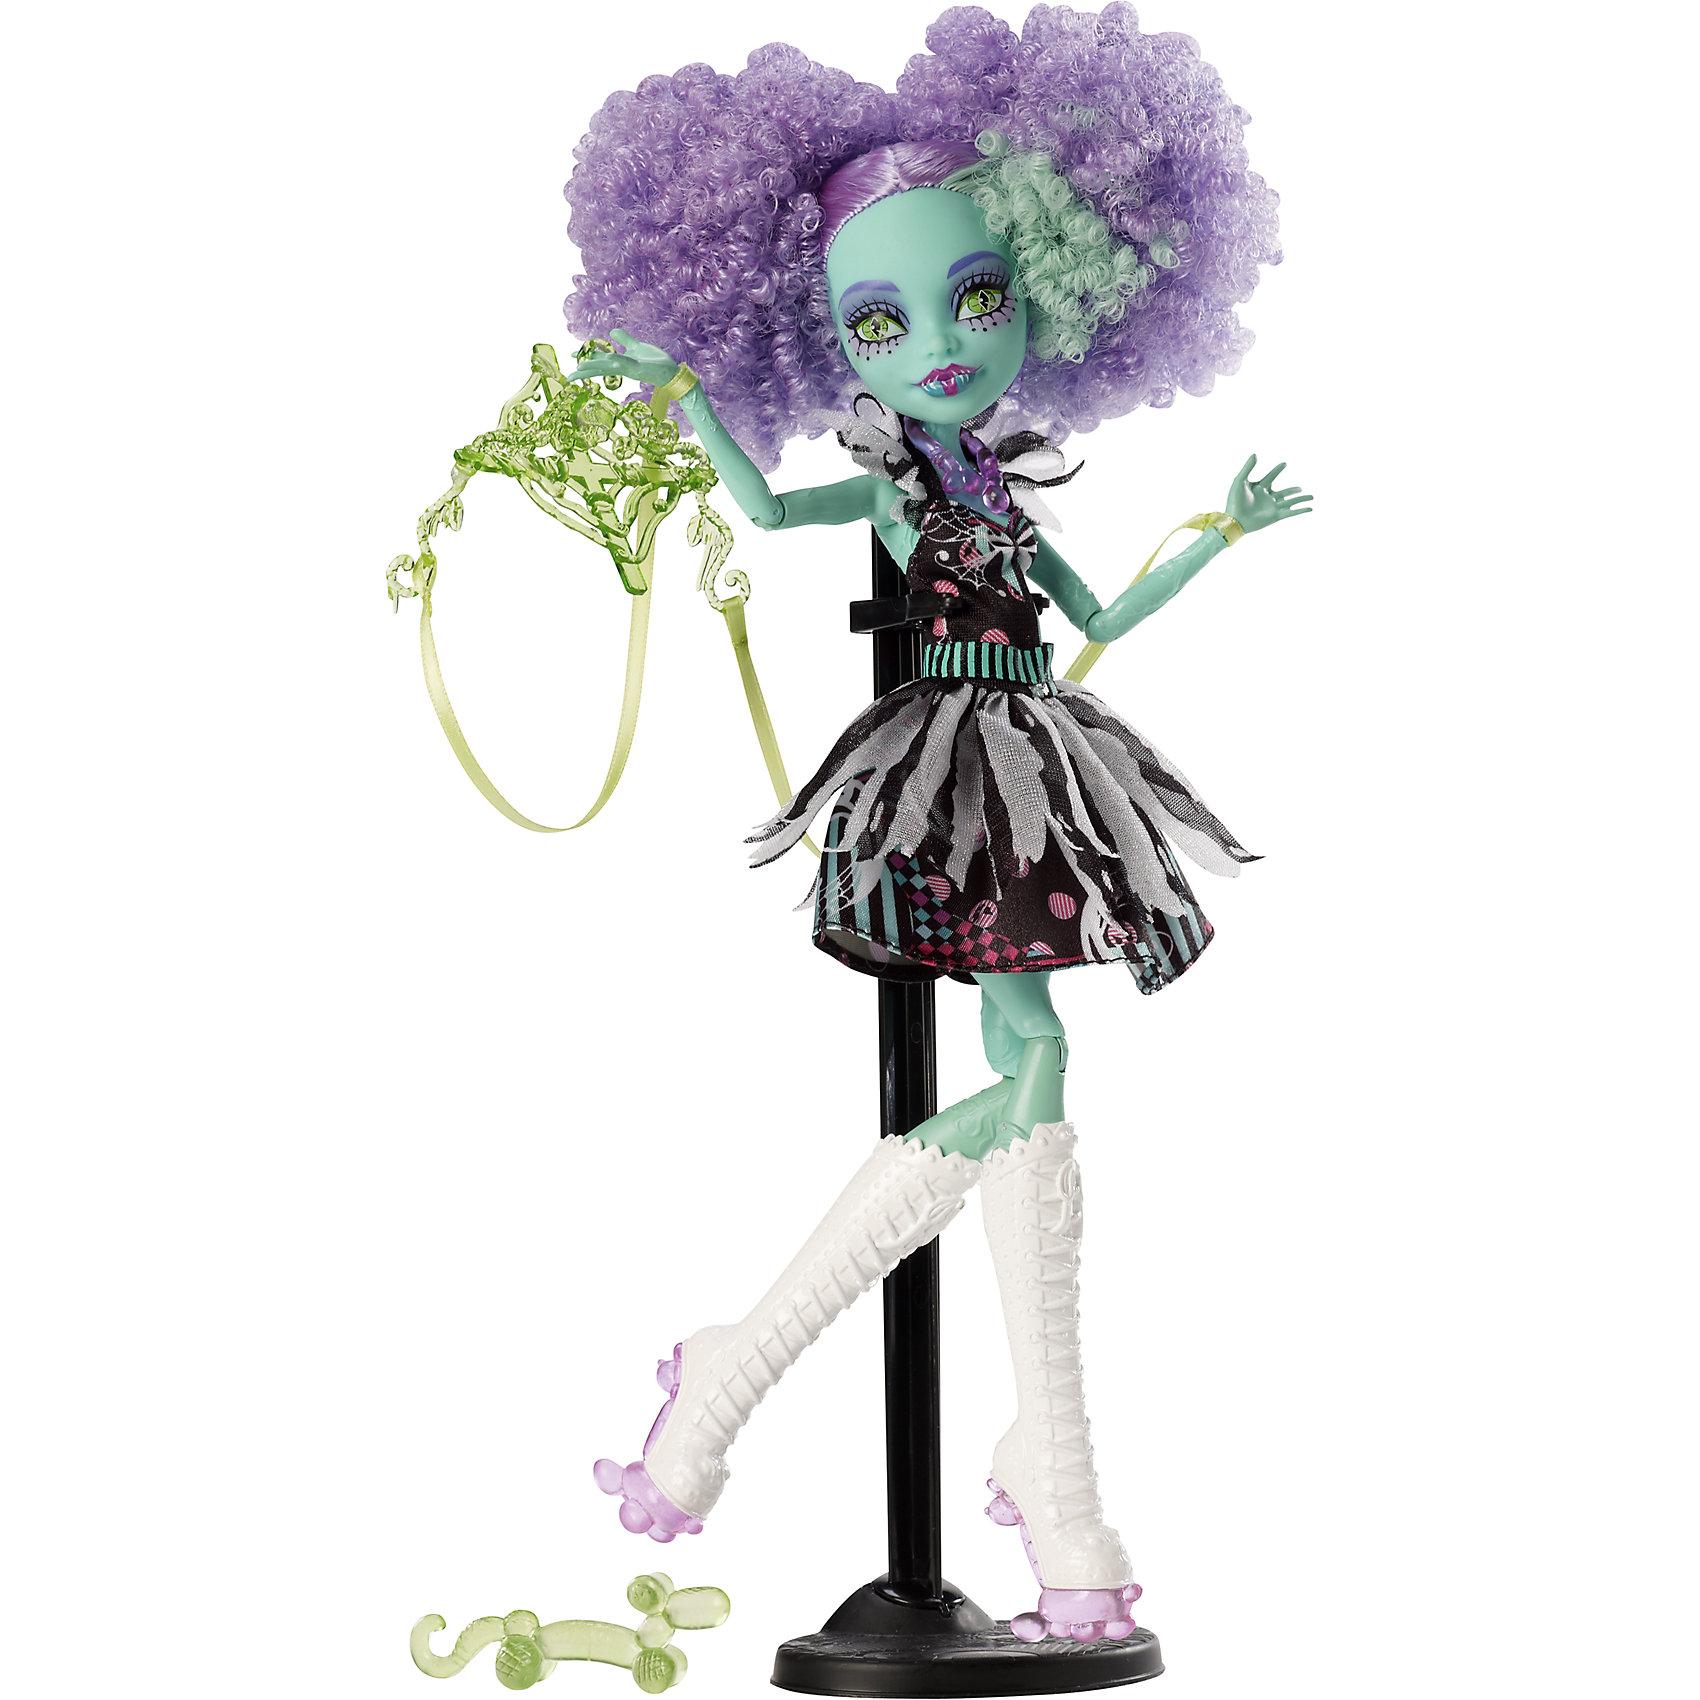 Mattel Кукла Фрик дю Шик  Шапито, Monster High детские наклейки монстер хай monster high альбом наклеек